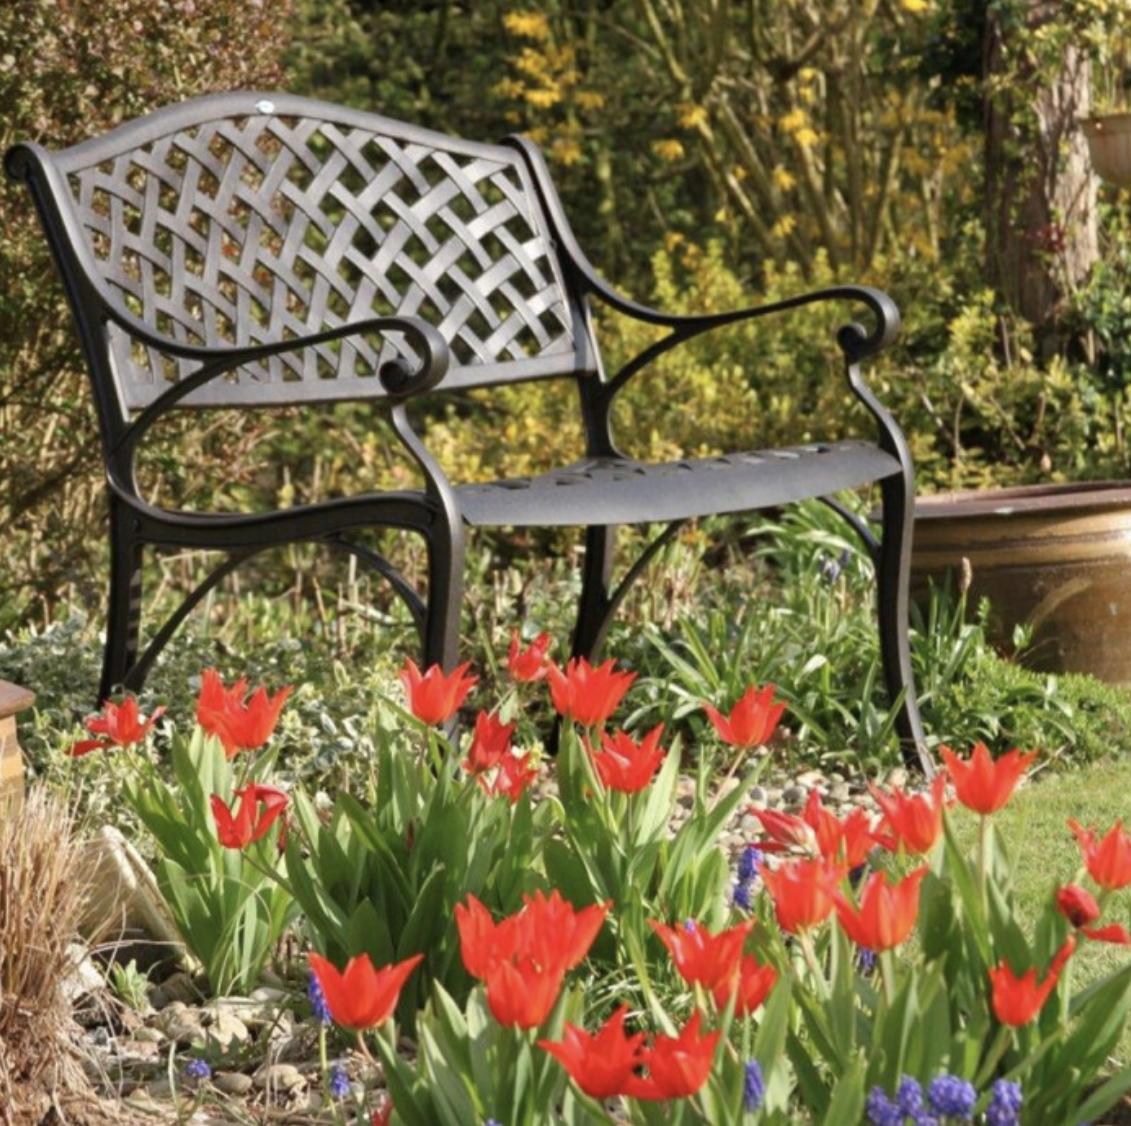 Jasmine Garden Bench in Antique Bronze